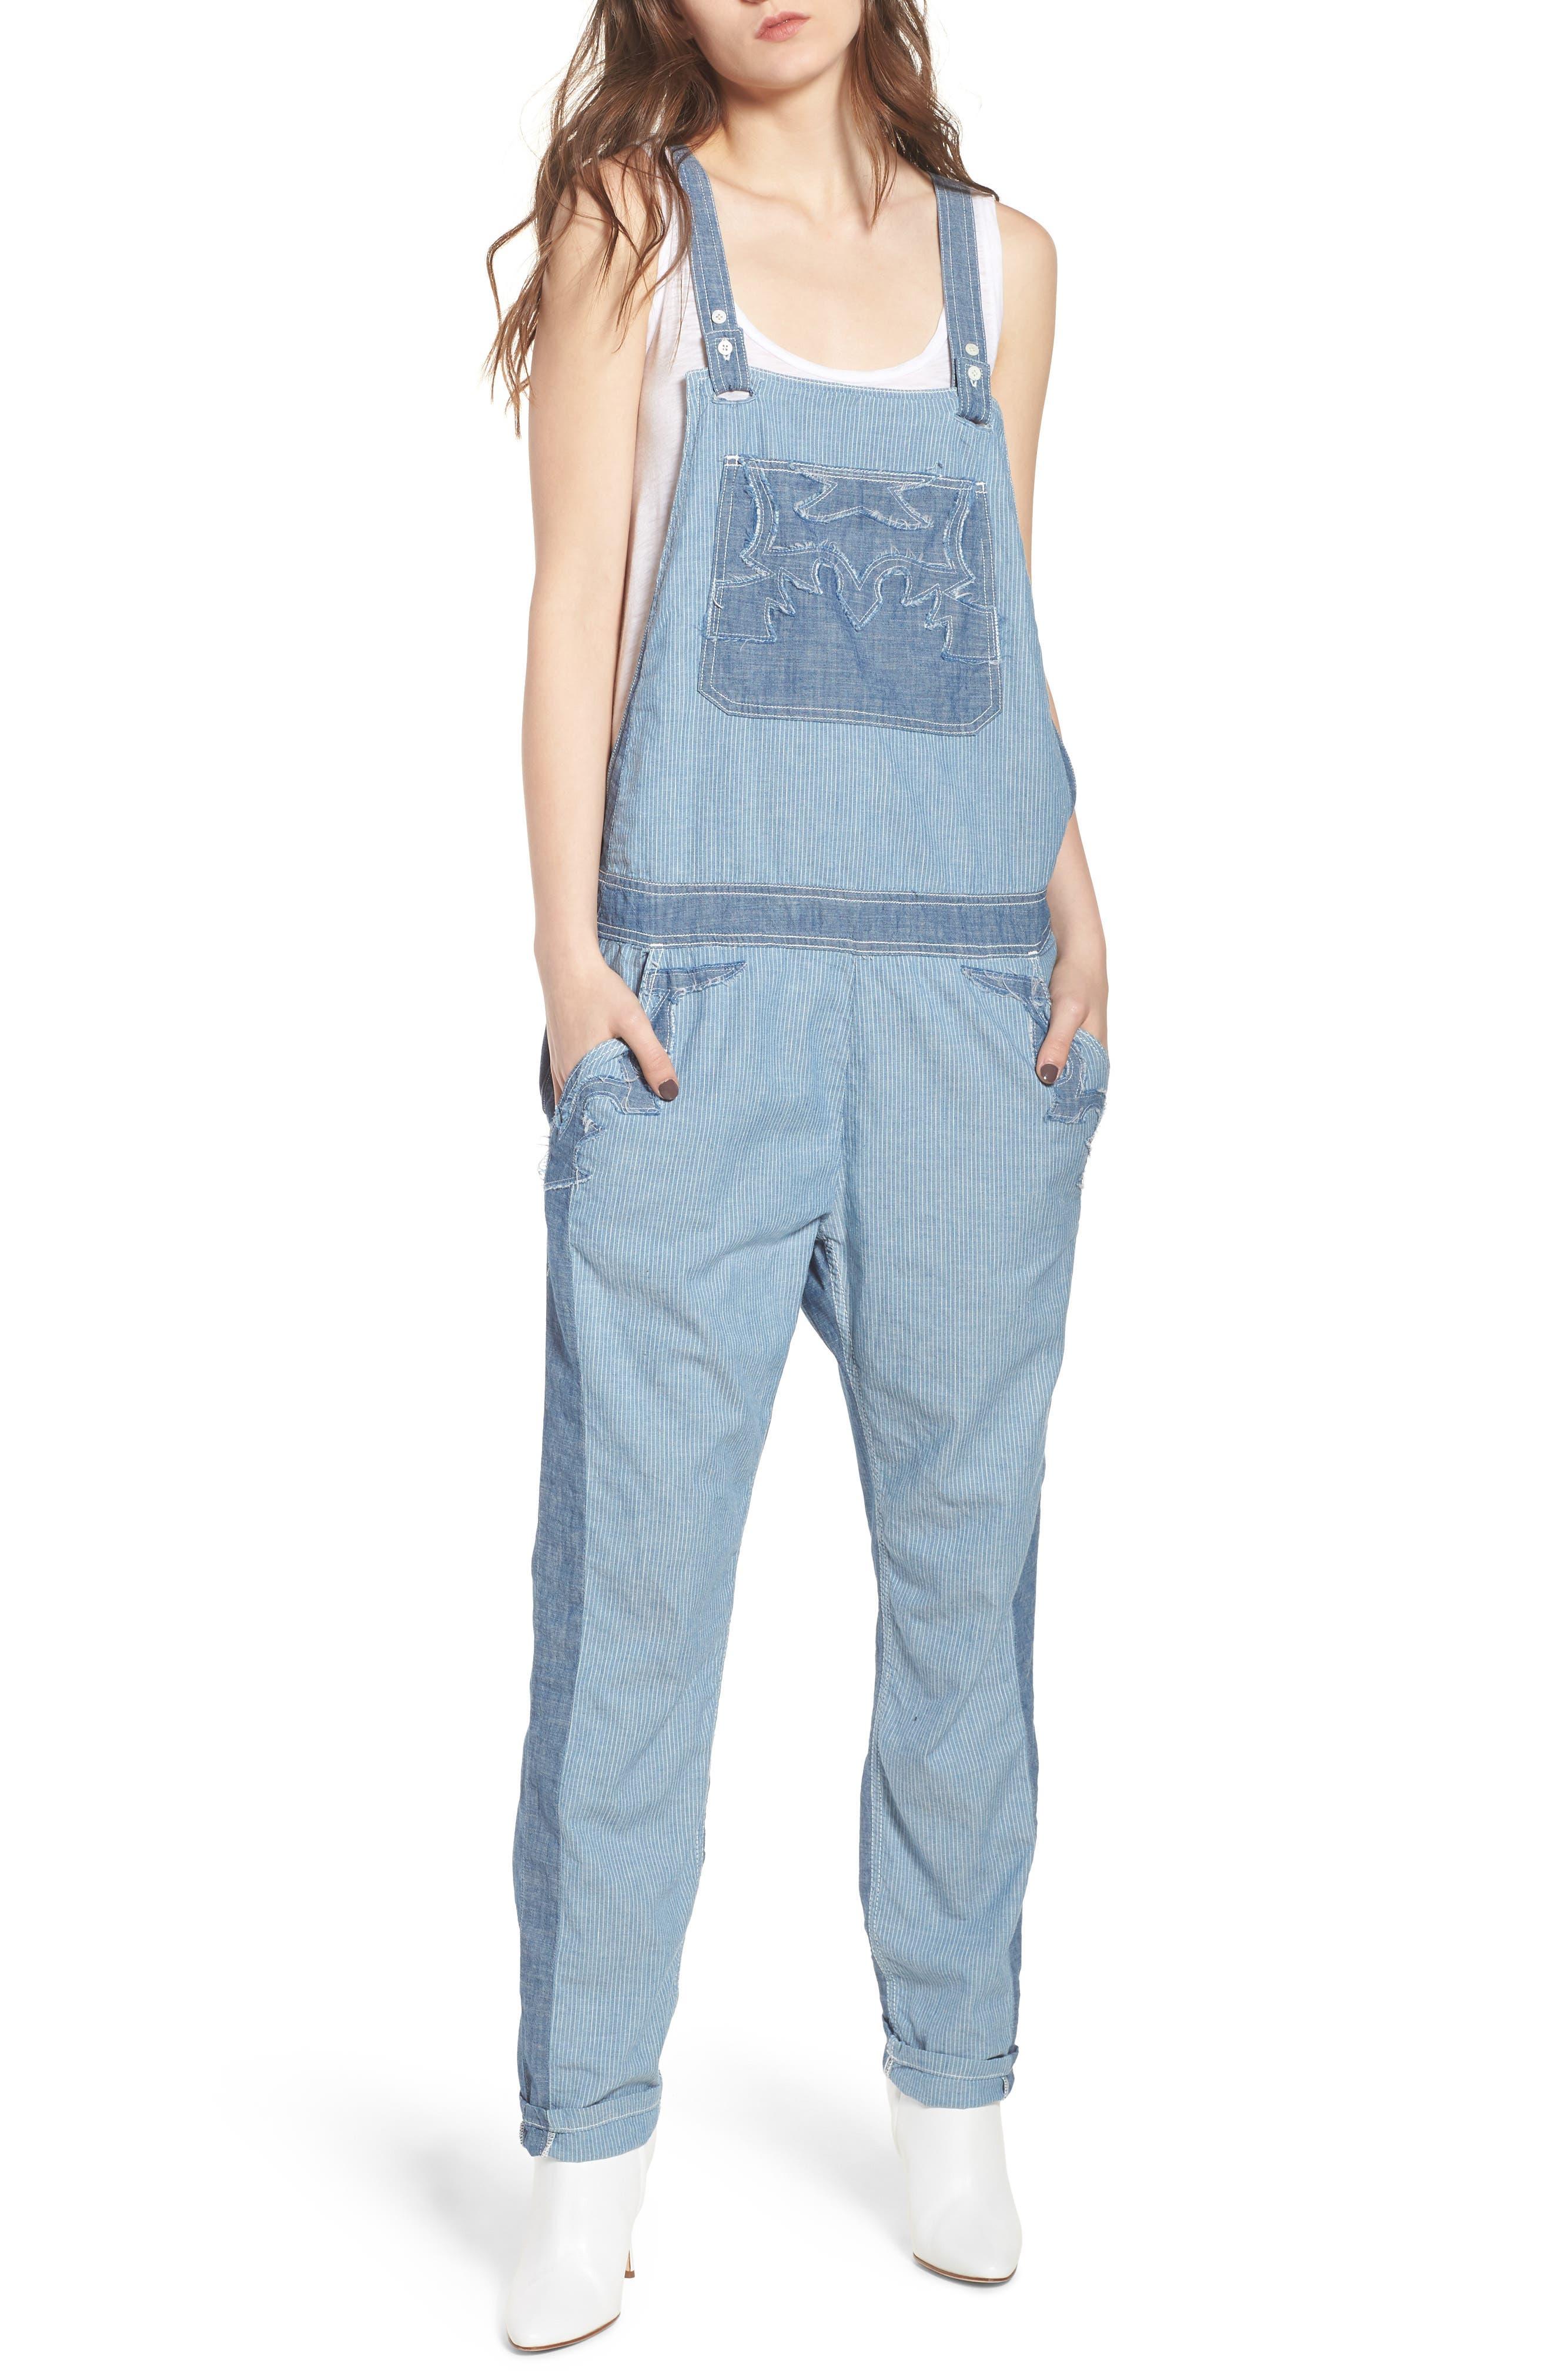 Sidney Patch Overalls,                         Main,                         color, Bleu